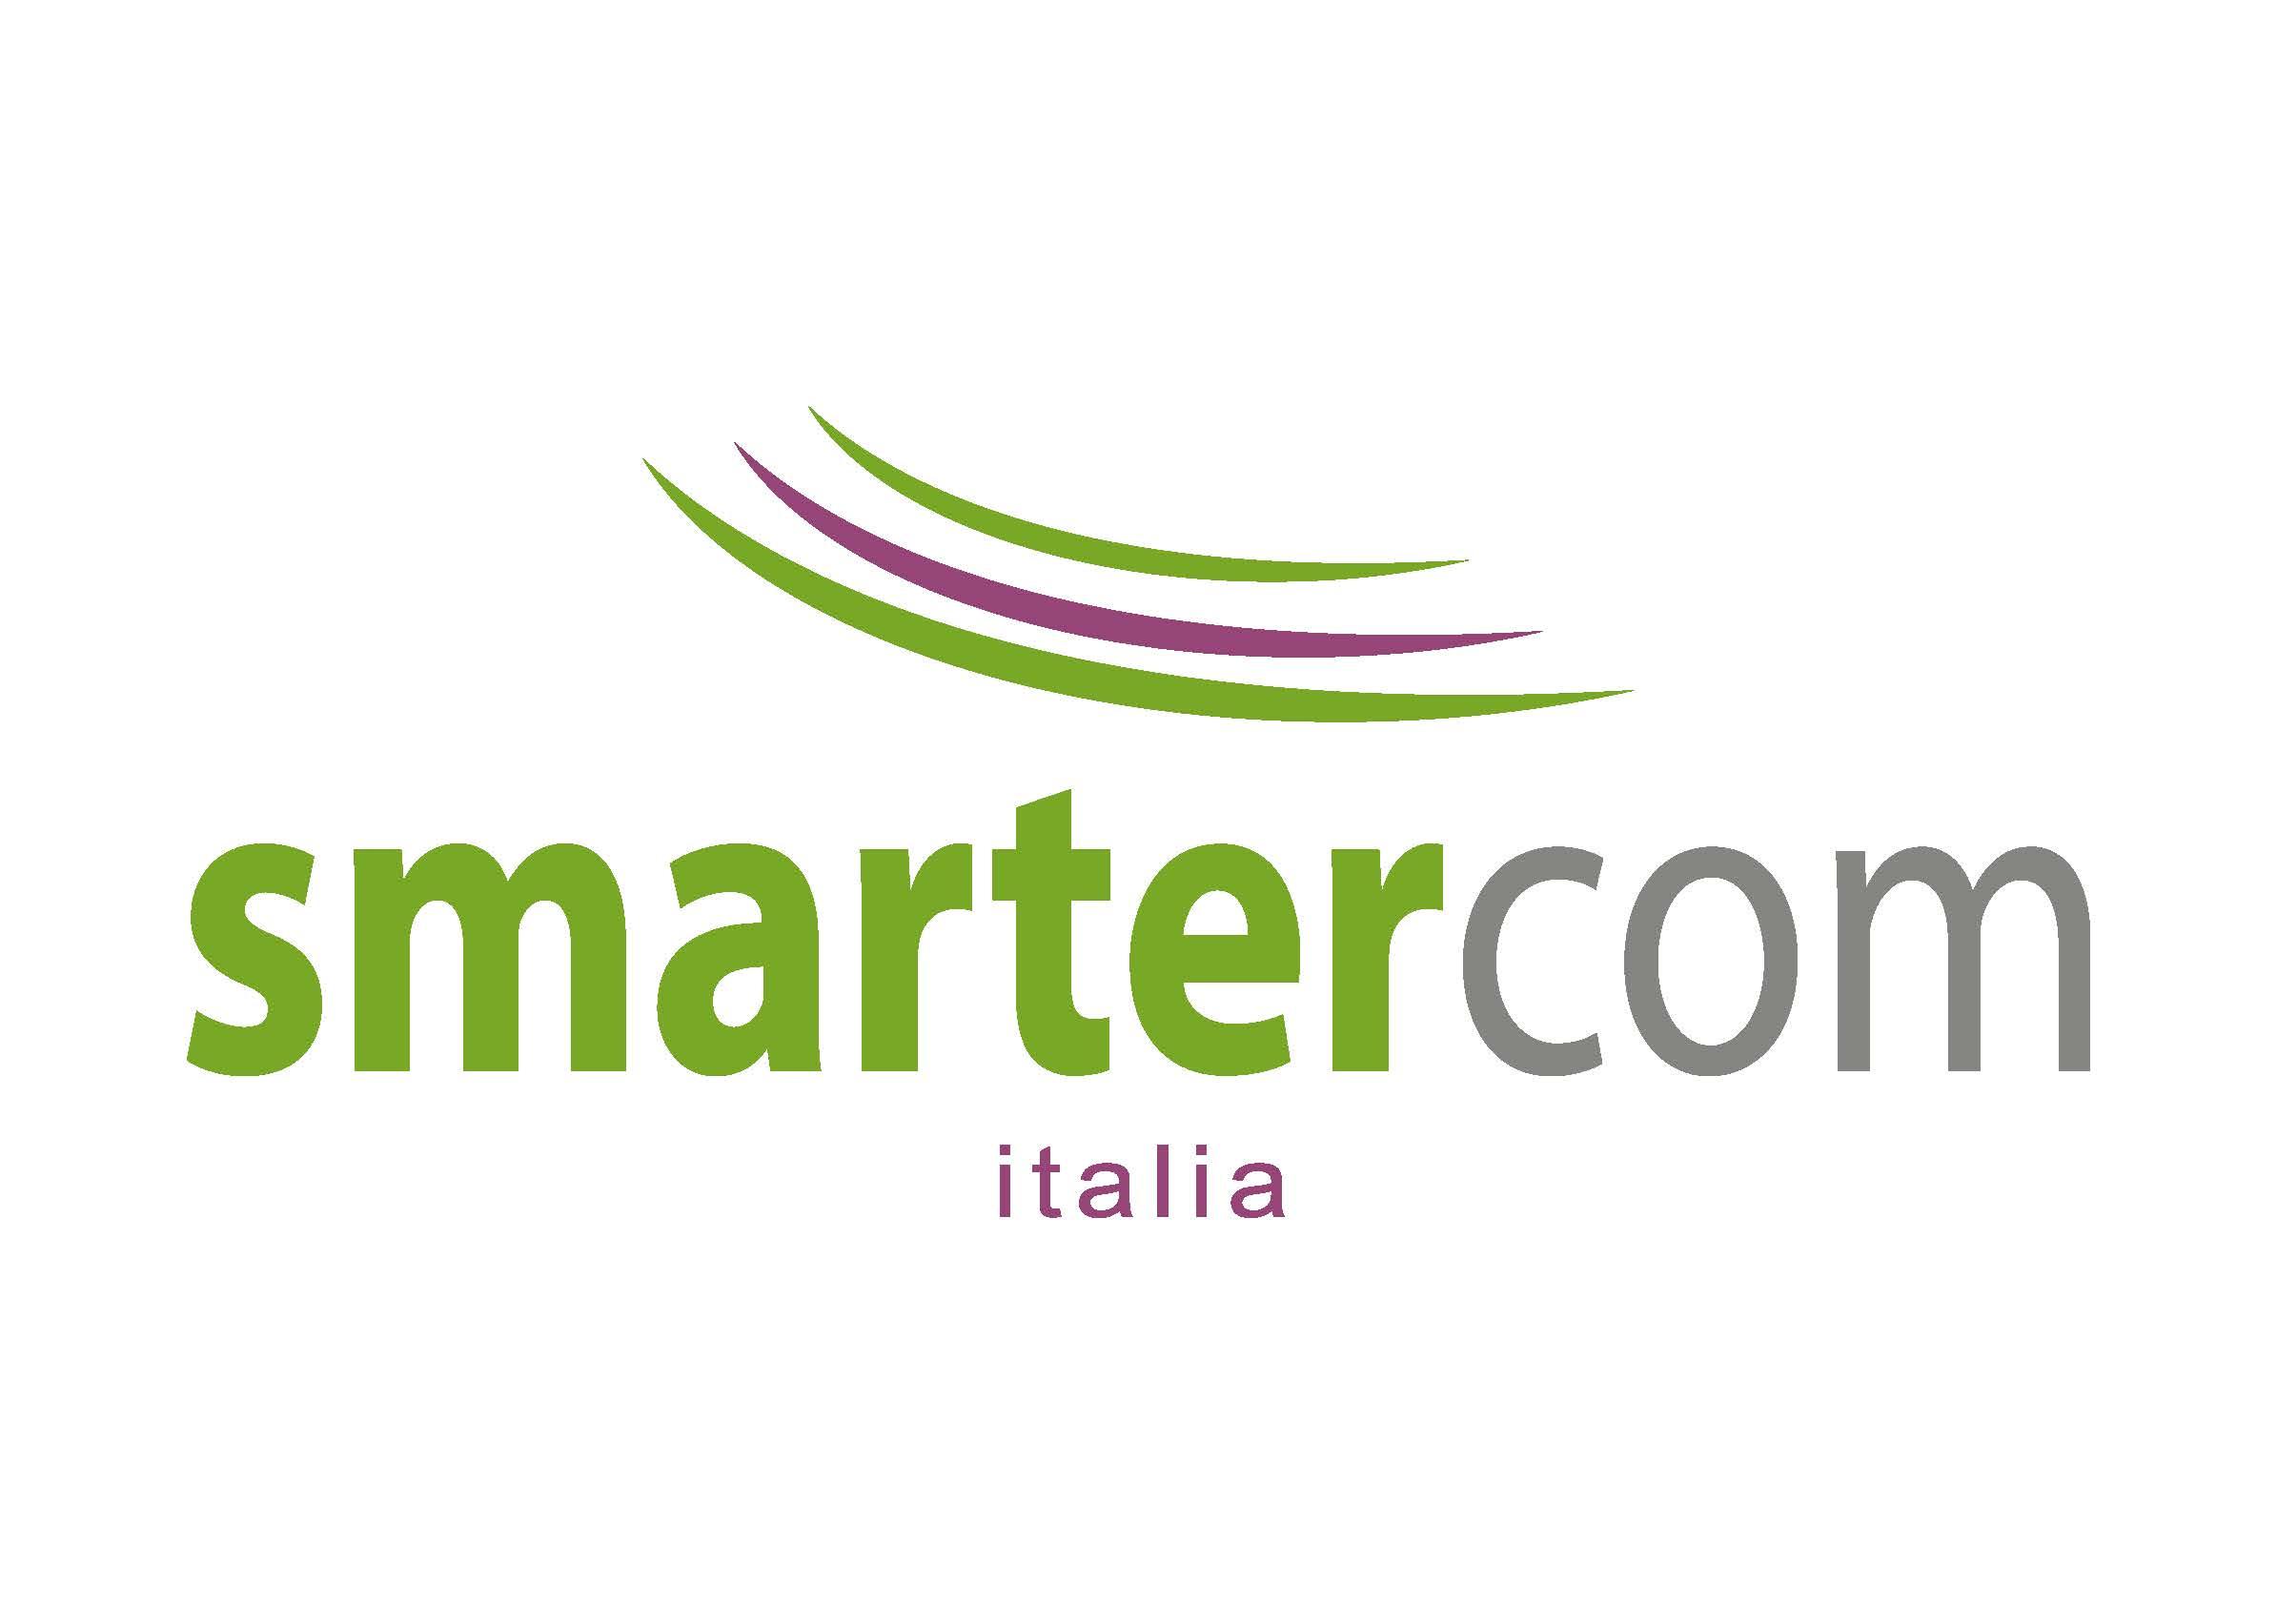 Smartercom italia srl smau for Wenko italia srl